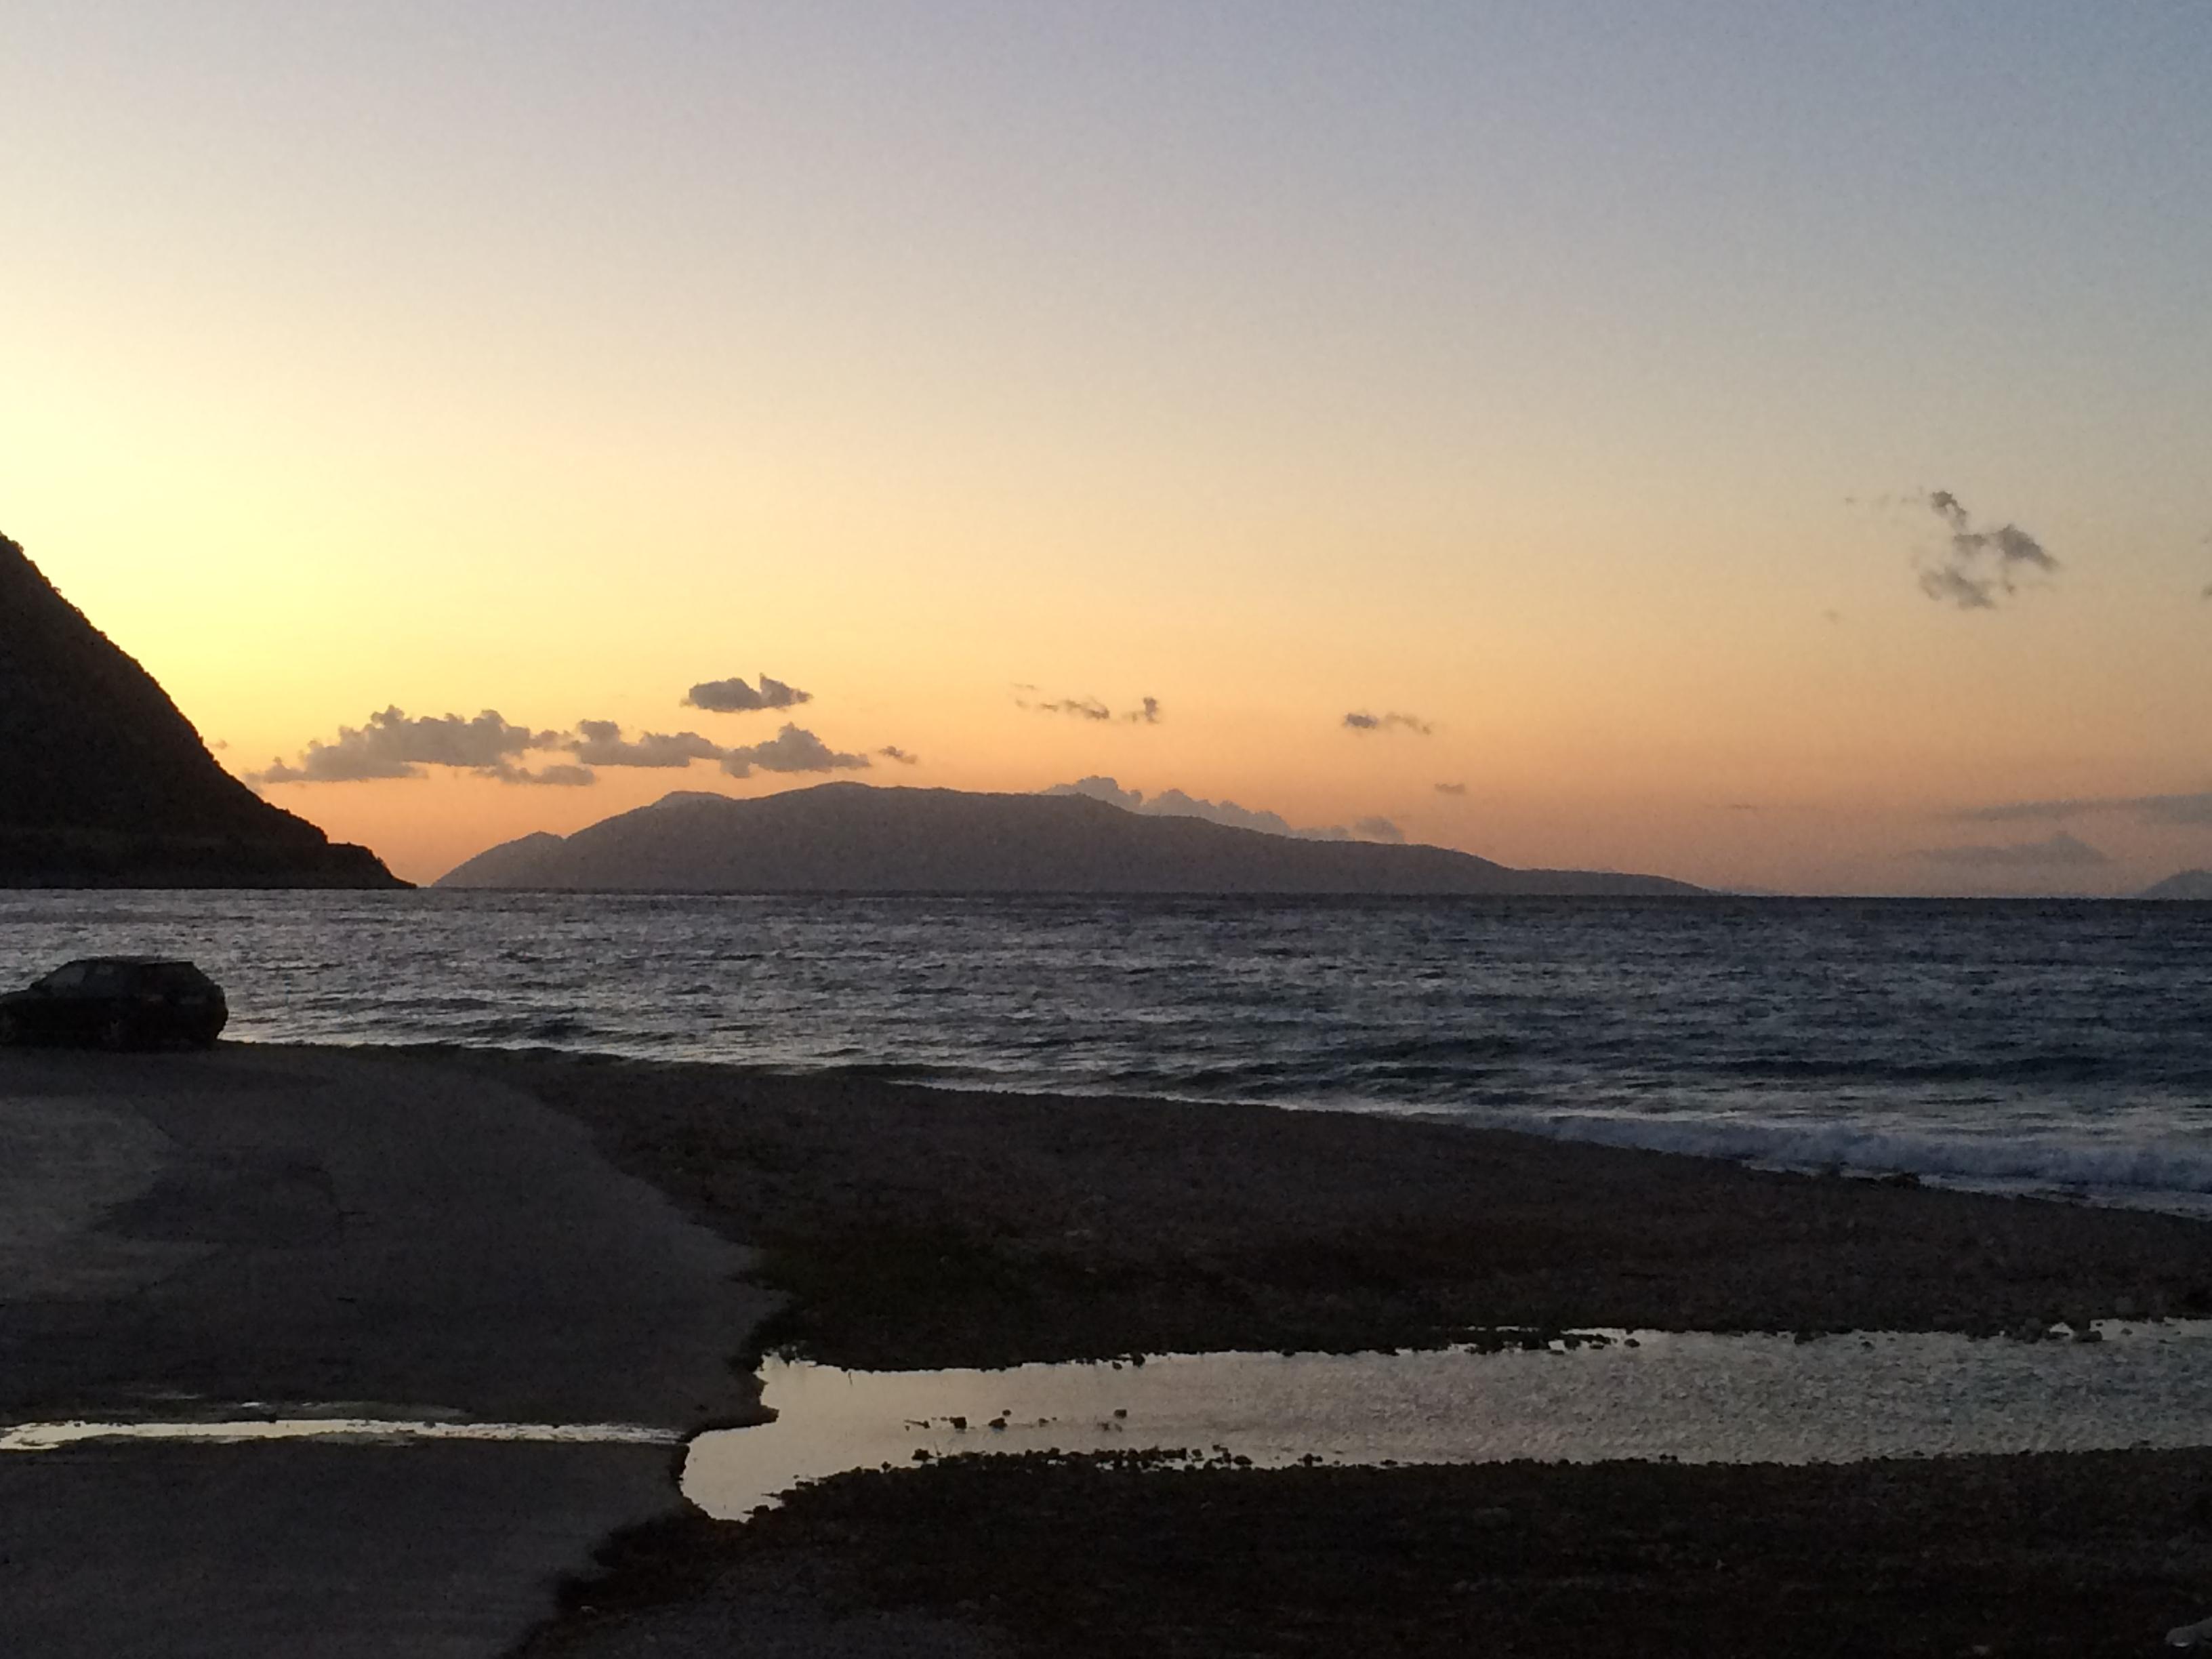 Tramonto a Poros, con vista sulla terra ferma